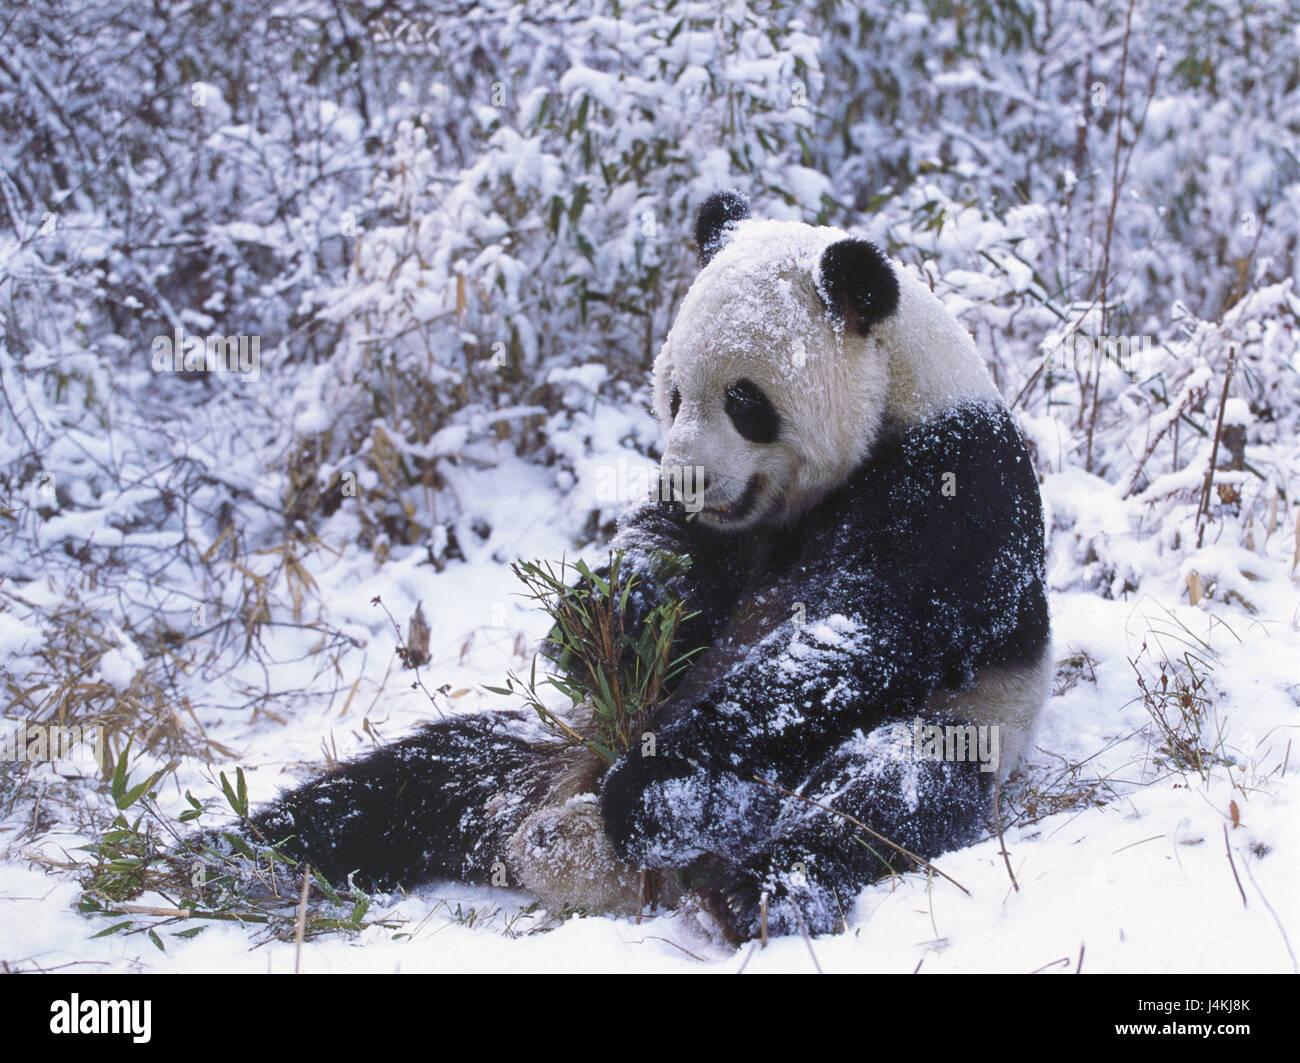 Le bois, grand panda, Ailuropoda melanoleuca, s'asseoir, de bambou, de l'ingestion, l'hiver, le monde Photo Stock